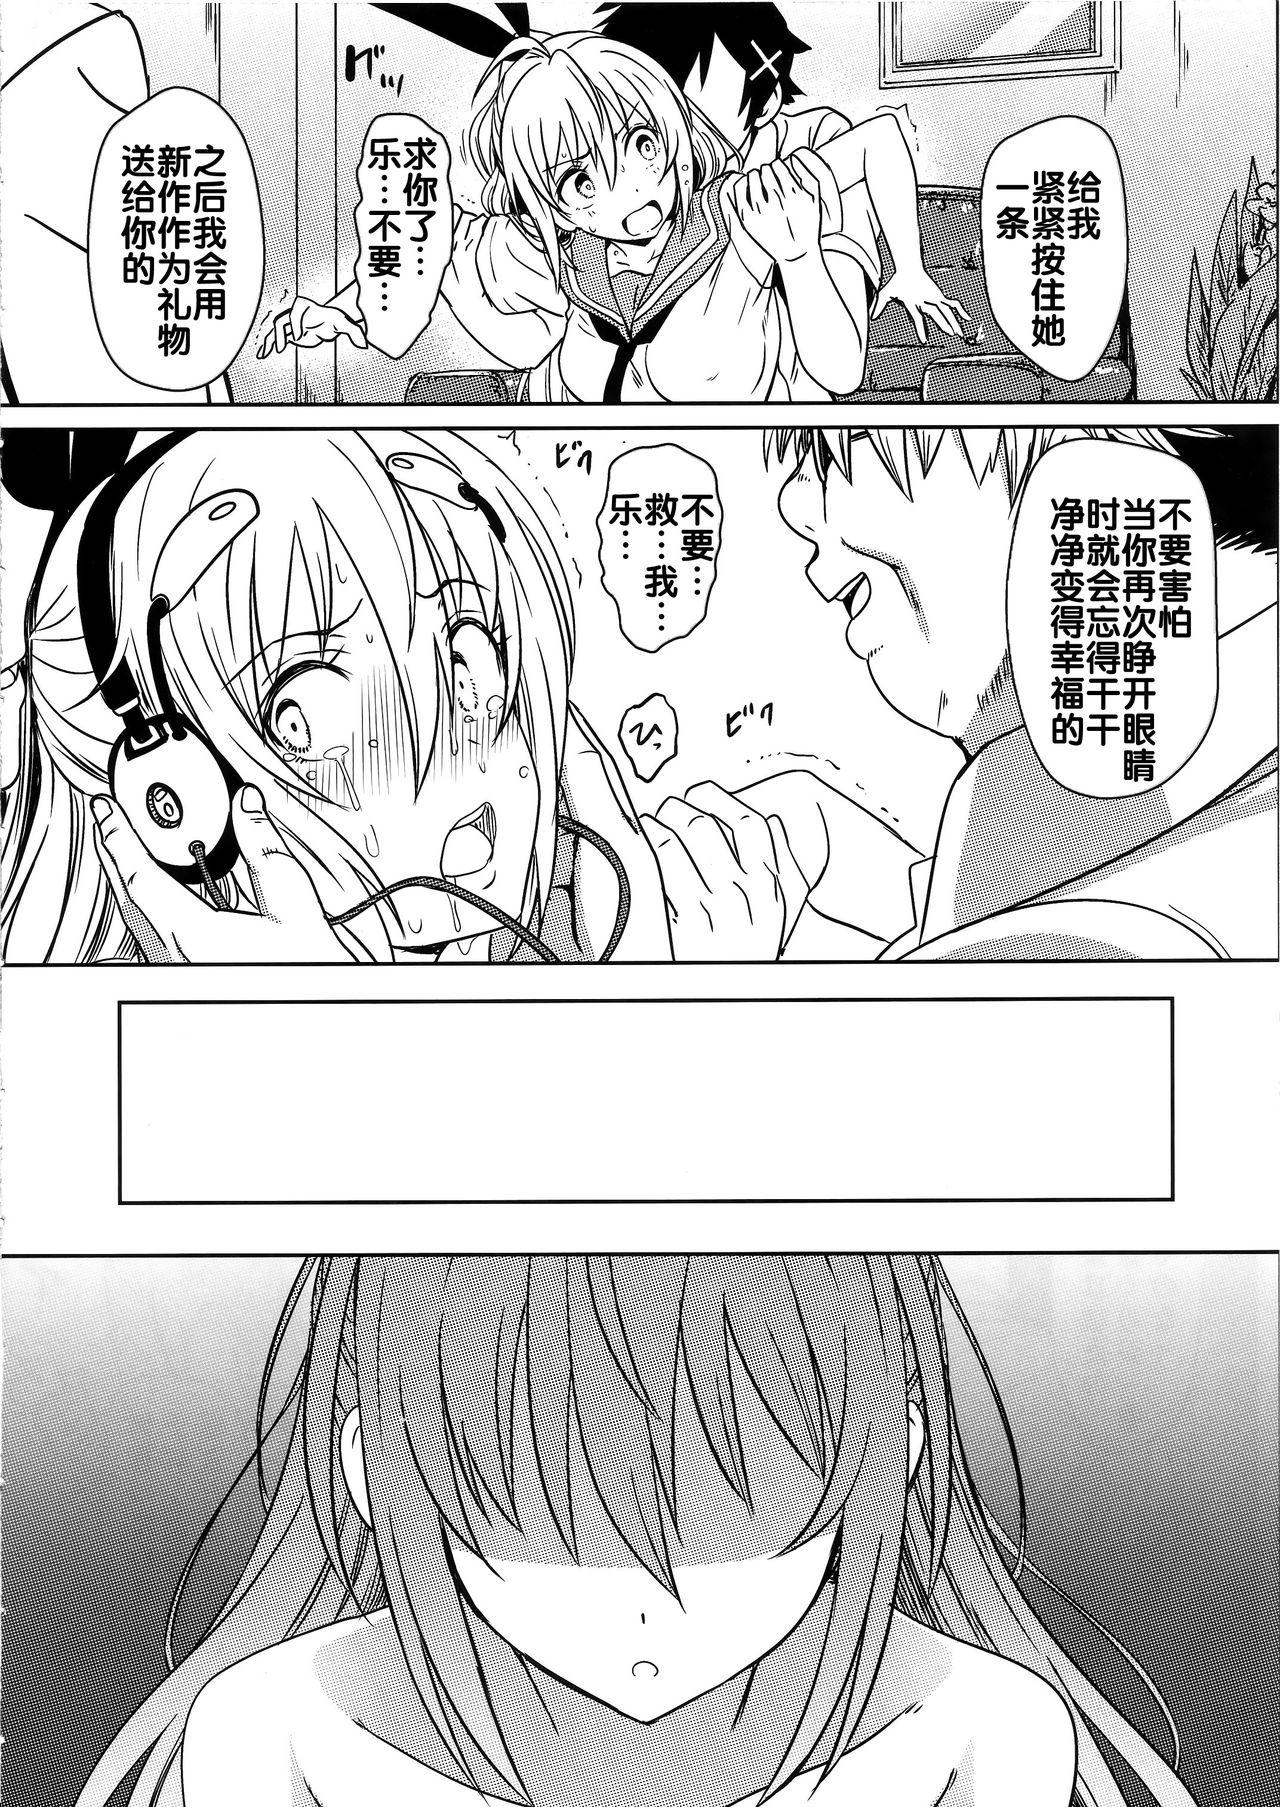 (C96) [Kaminari-neko (Eitarou)] Yamikoi -Saimin- 4   闇恋 -催眠- 4 (Nisekoi) [Chinese] [后悔的神官个人汉化] 19